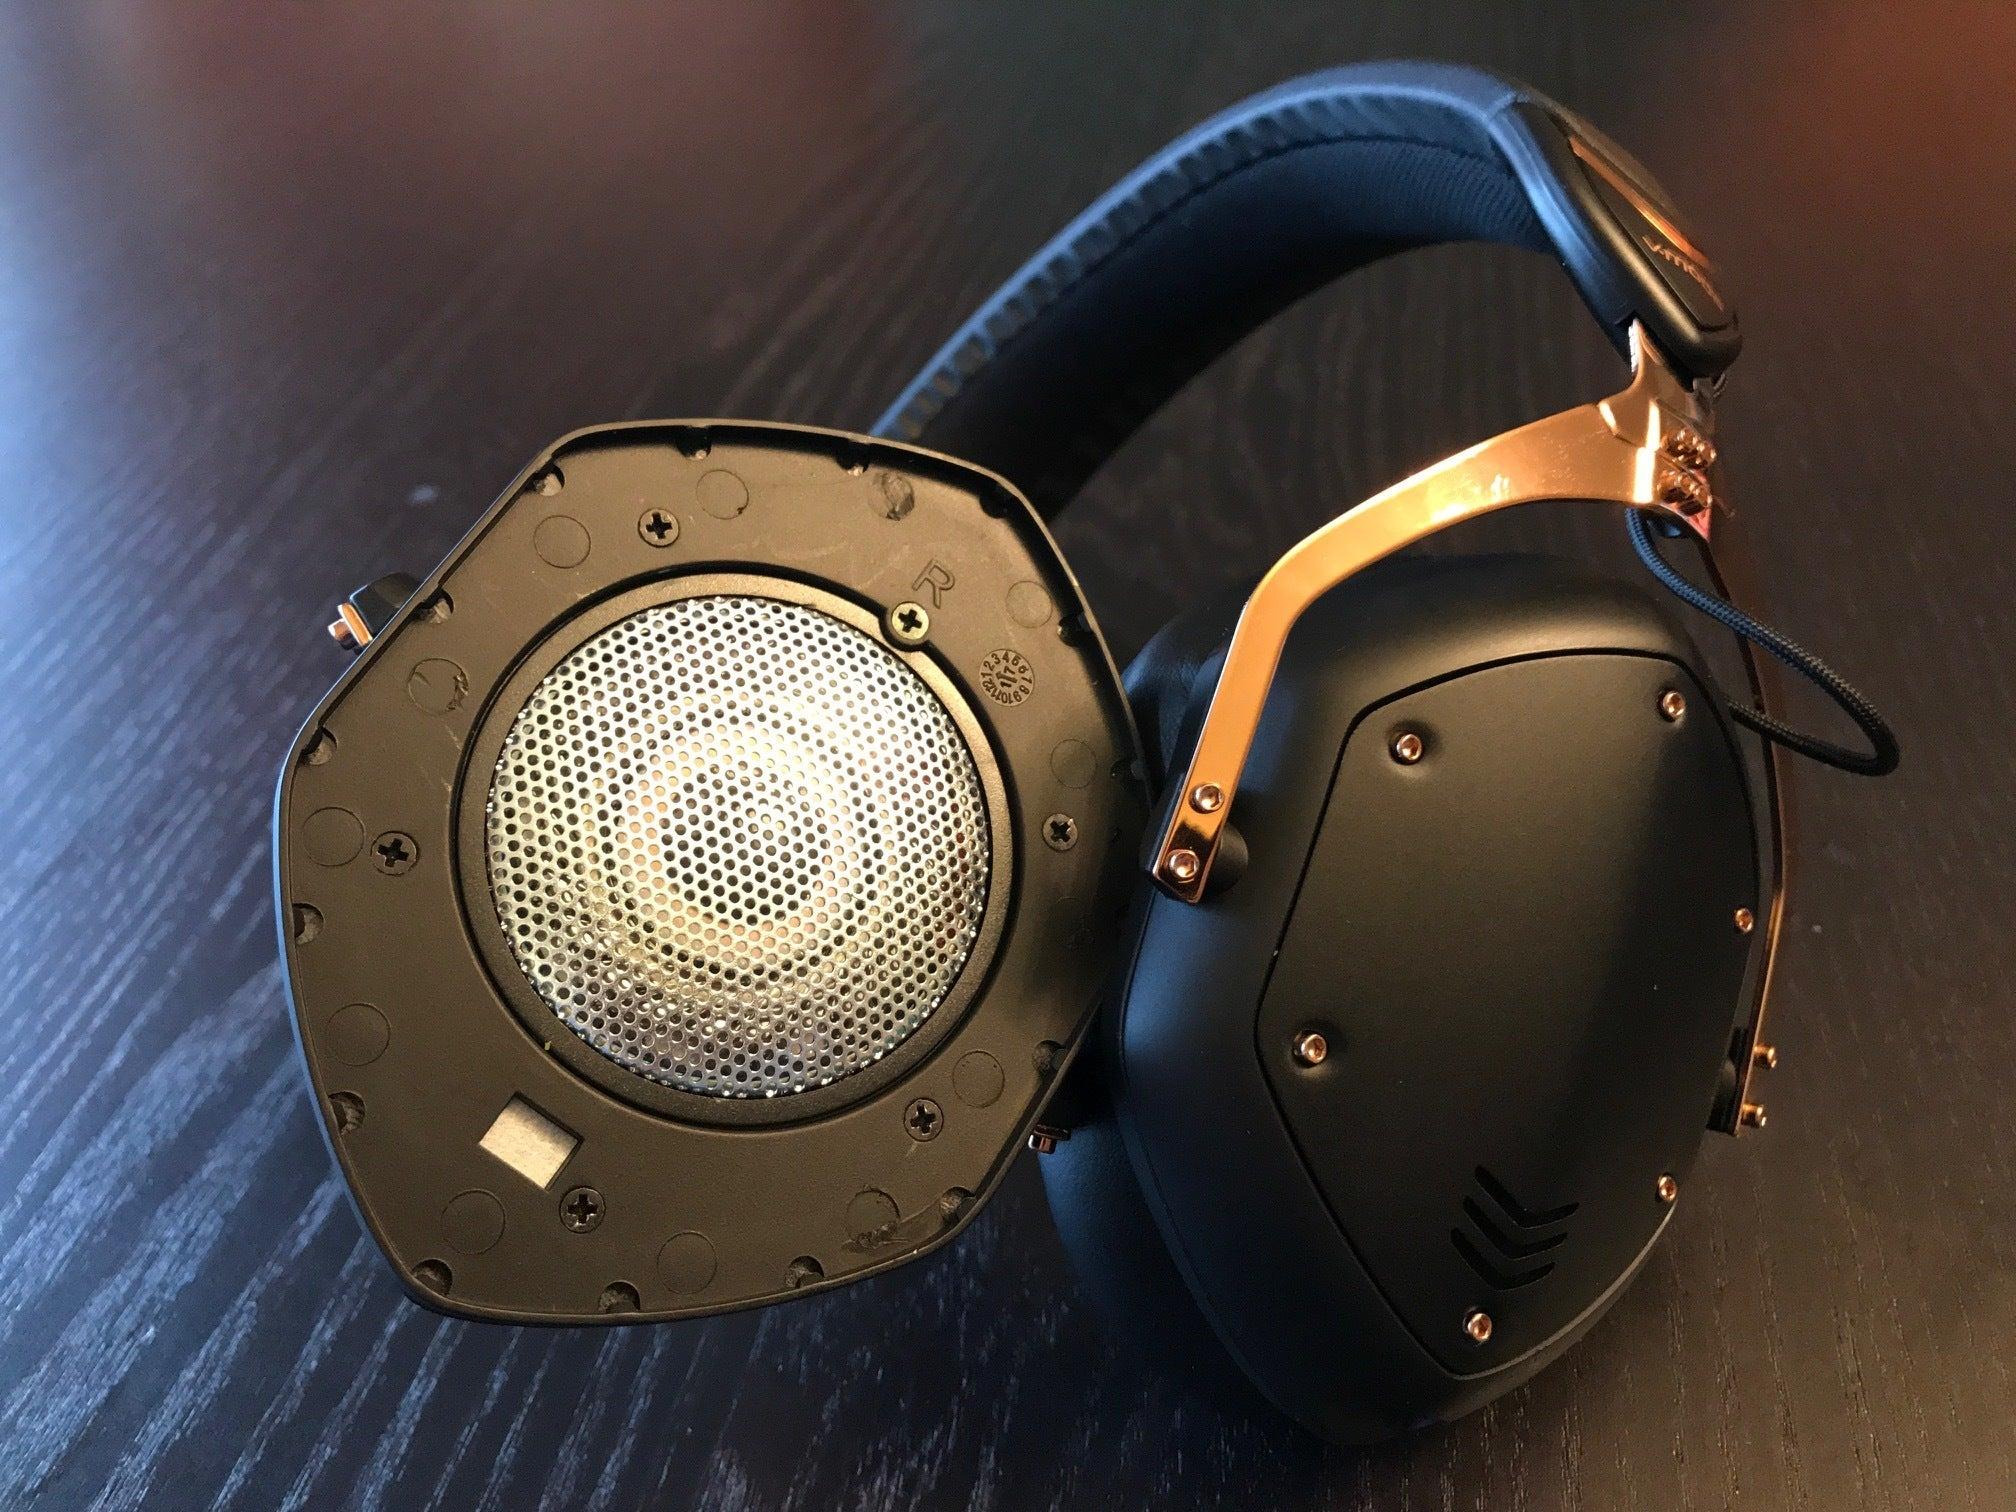 187ab7d7e439dc V-moda Crossfade 2 Wireless headphones: Exceptionally good cans ...